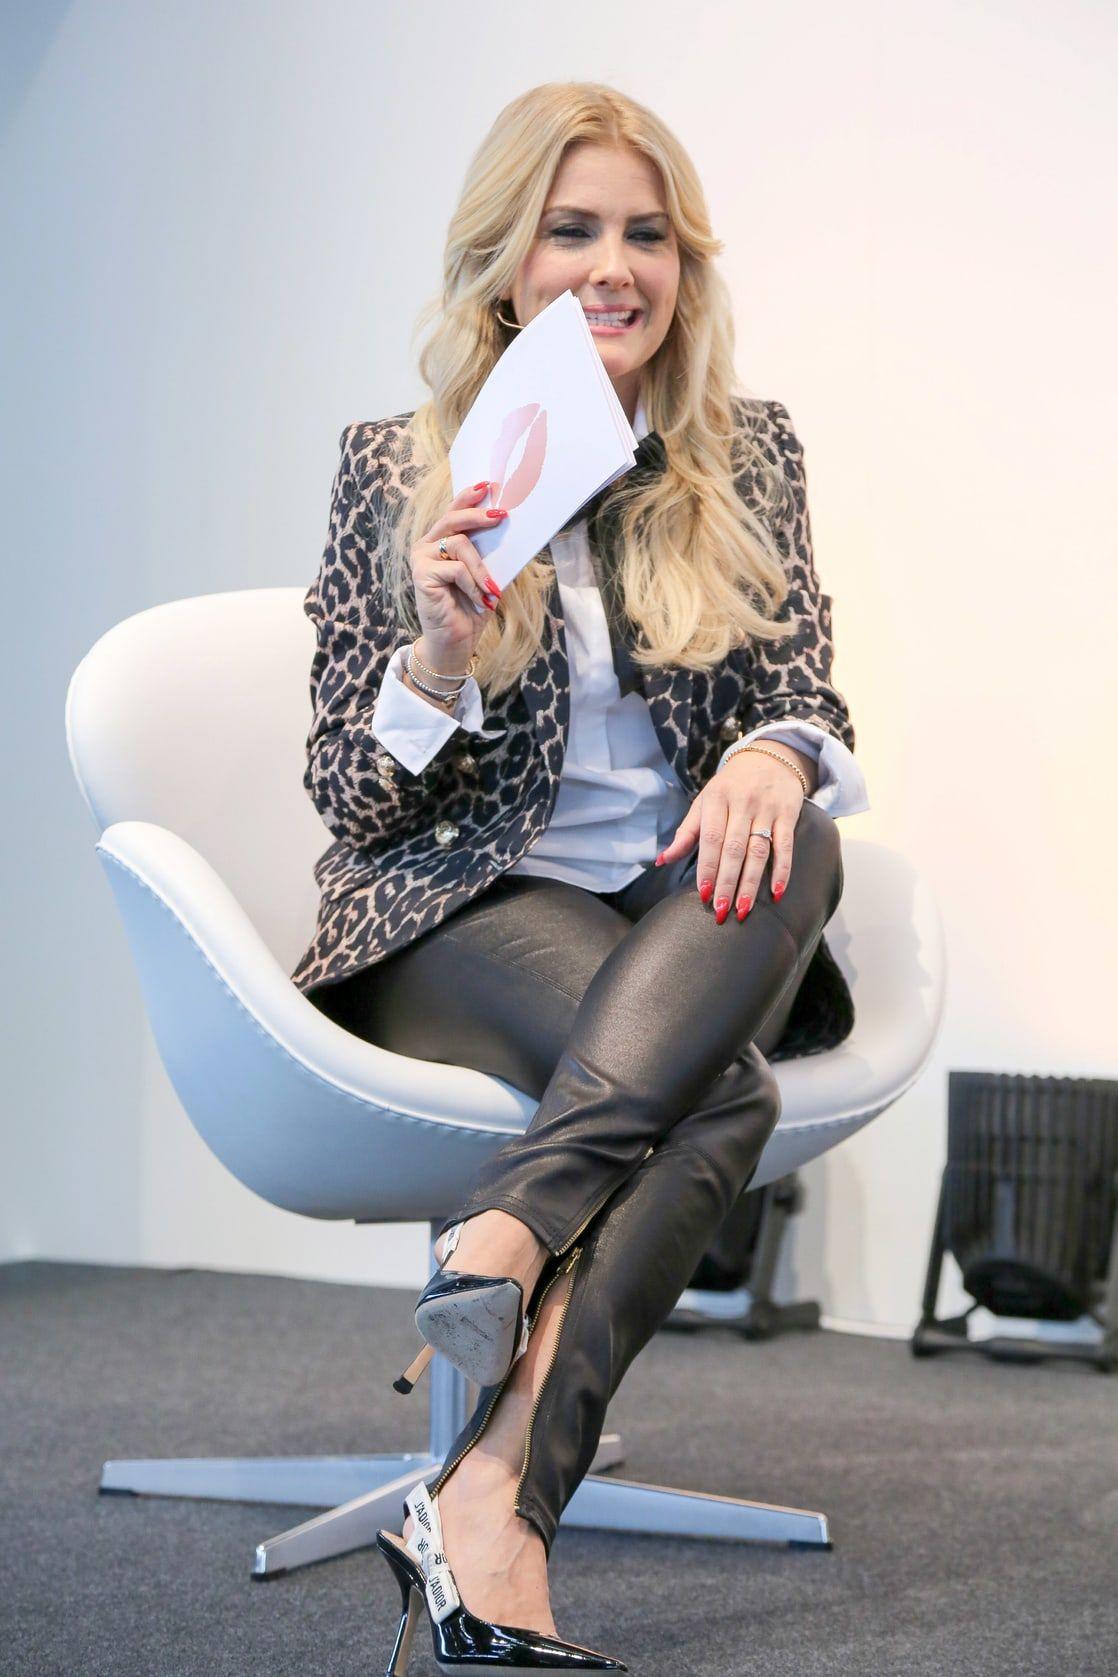 Jennifer Knable Leder Leggings Schone Frauen Und Mode Fur Frauen